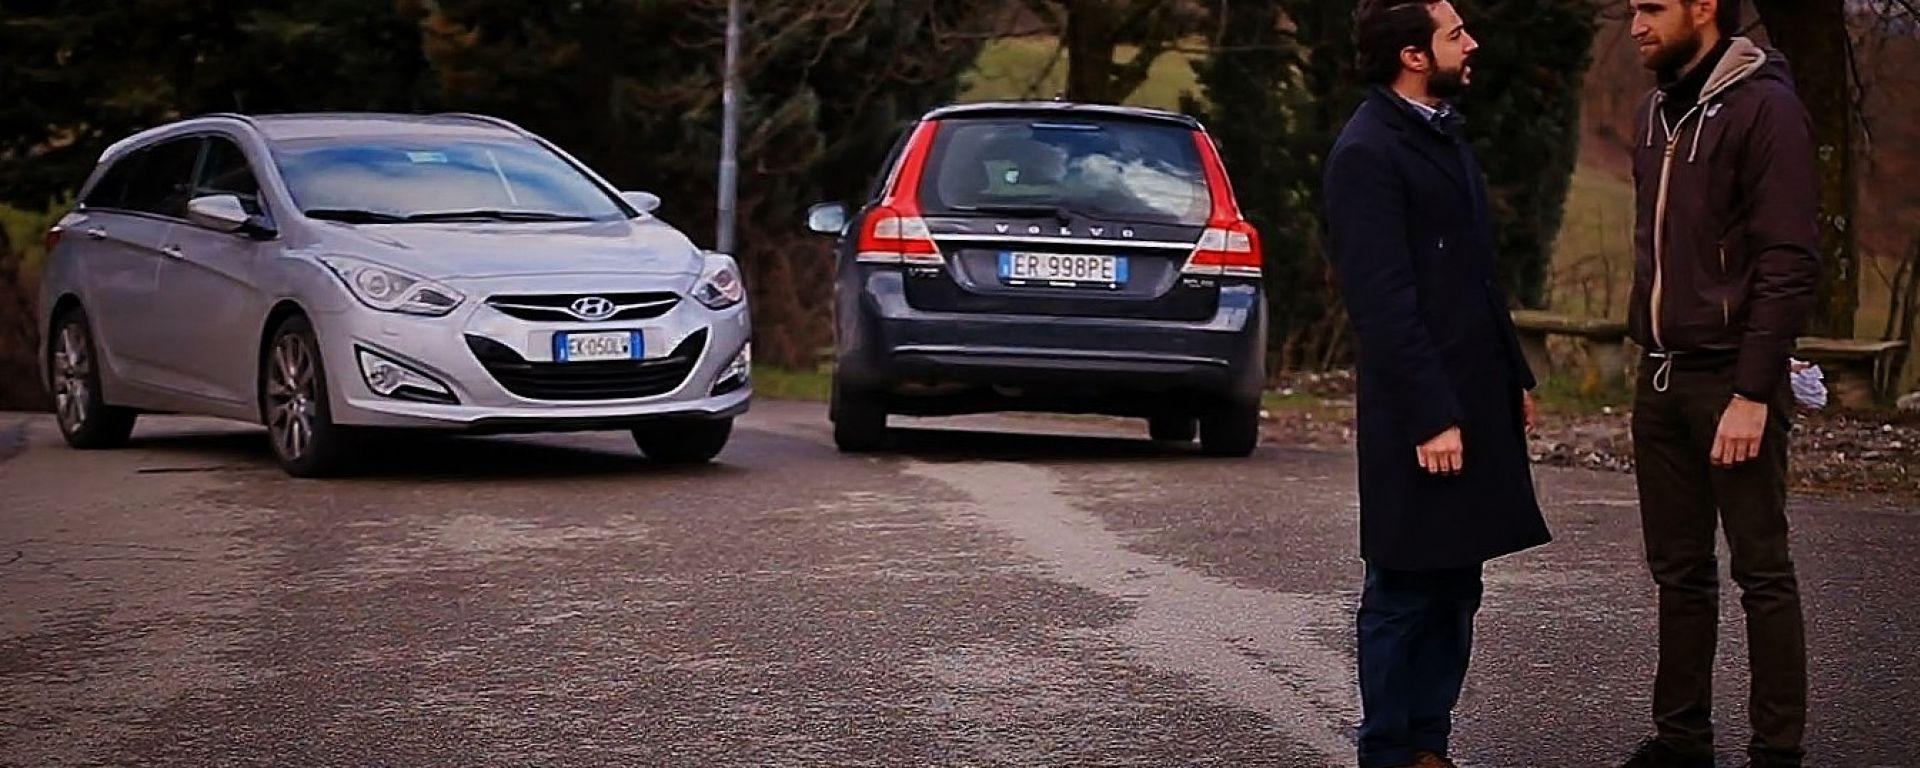 Volvo V70 Super Polar vs Hyundai i40 Style